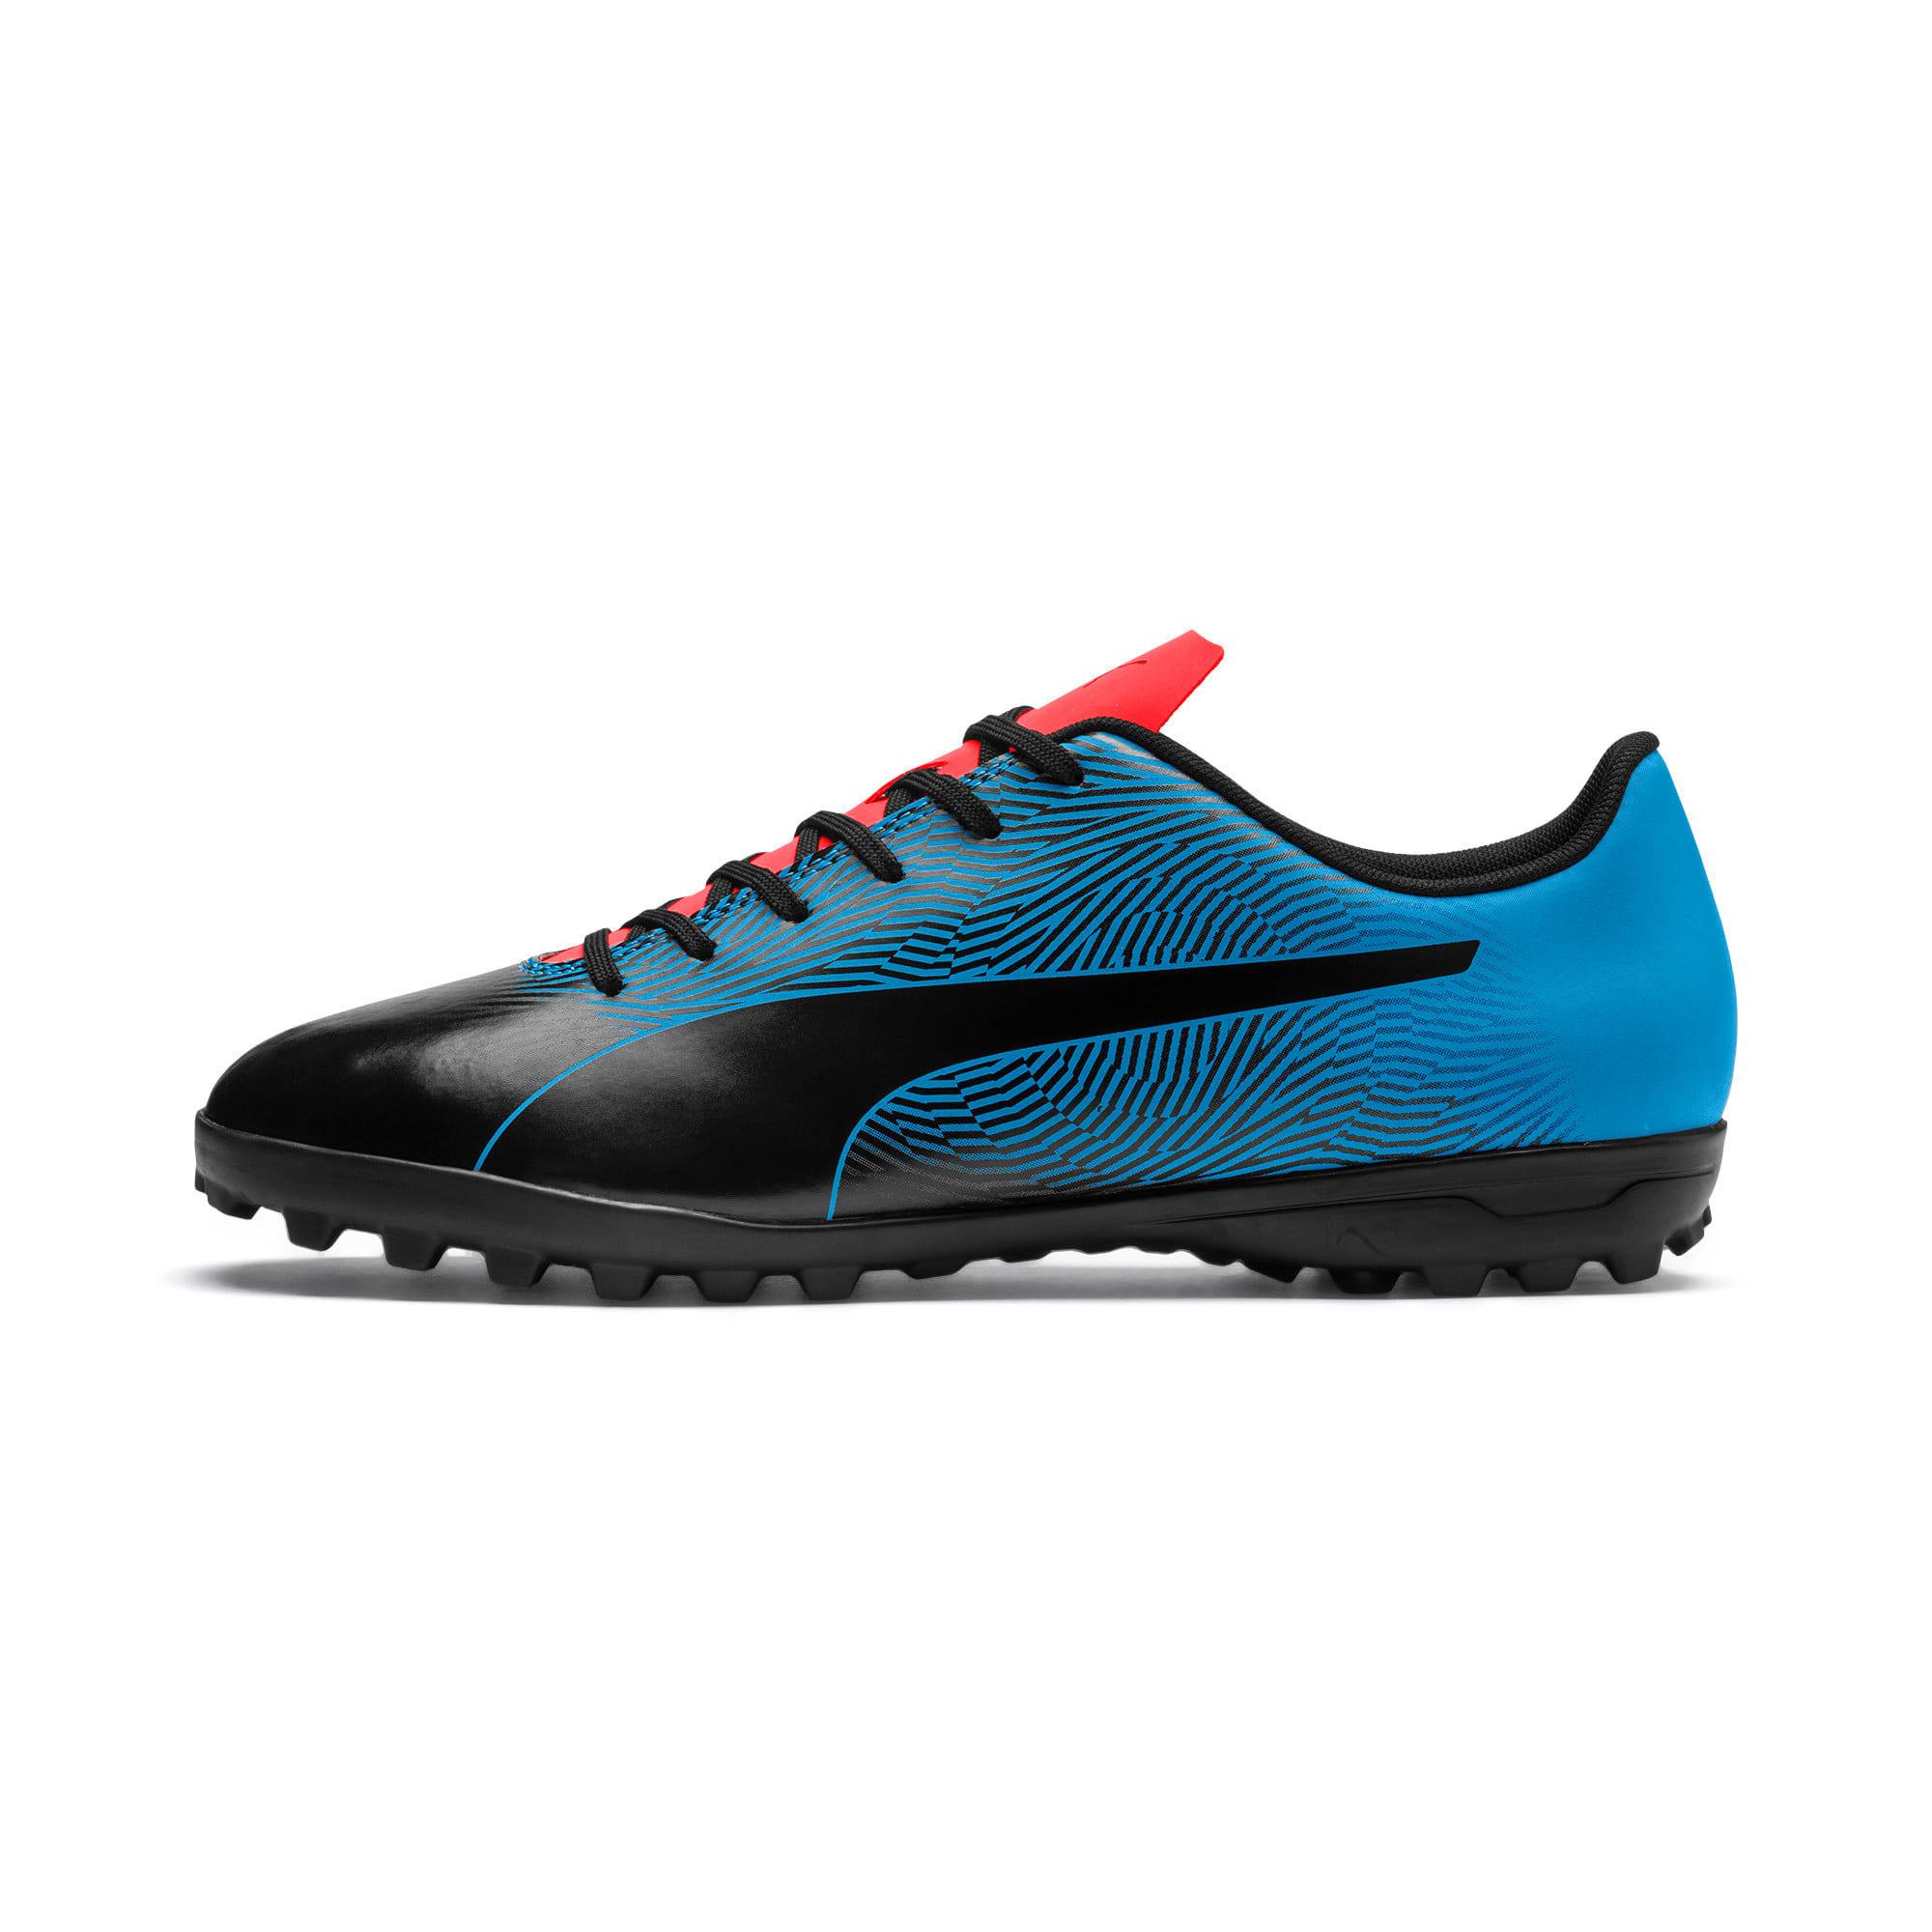 Thumbnail 1 of PUMA Spirit II TT Men's Soccer Shoes, Black-Bleu Azur-Red Blast, medium